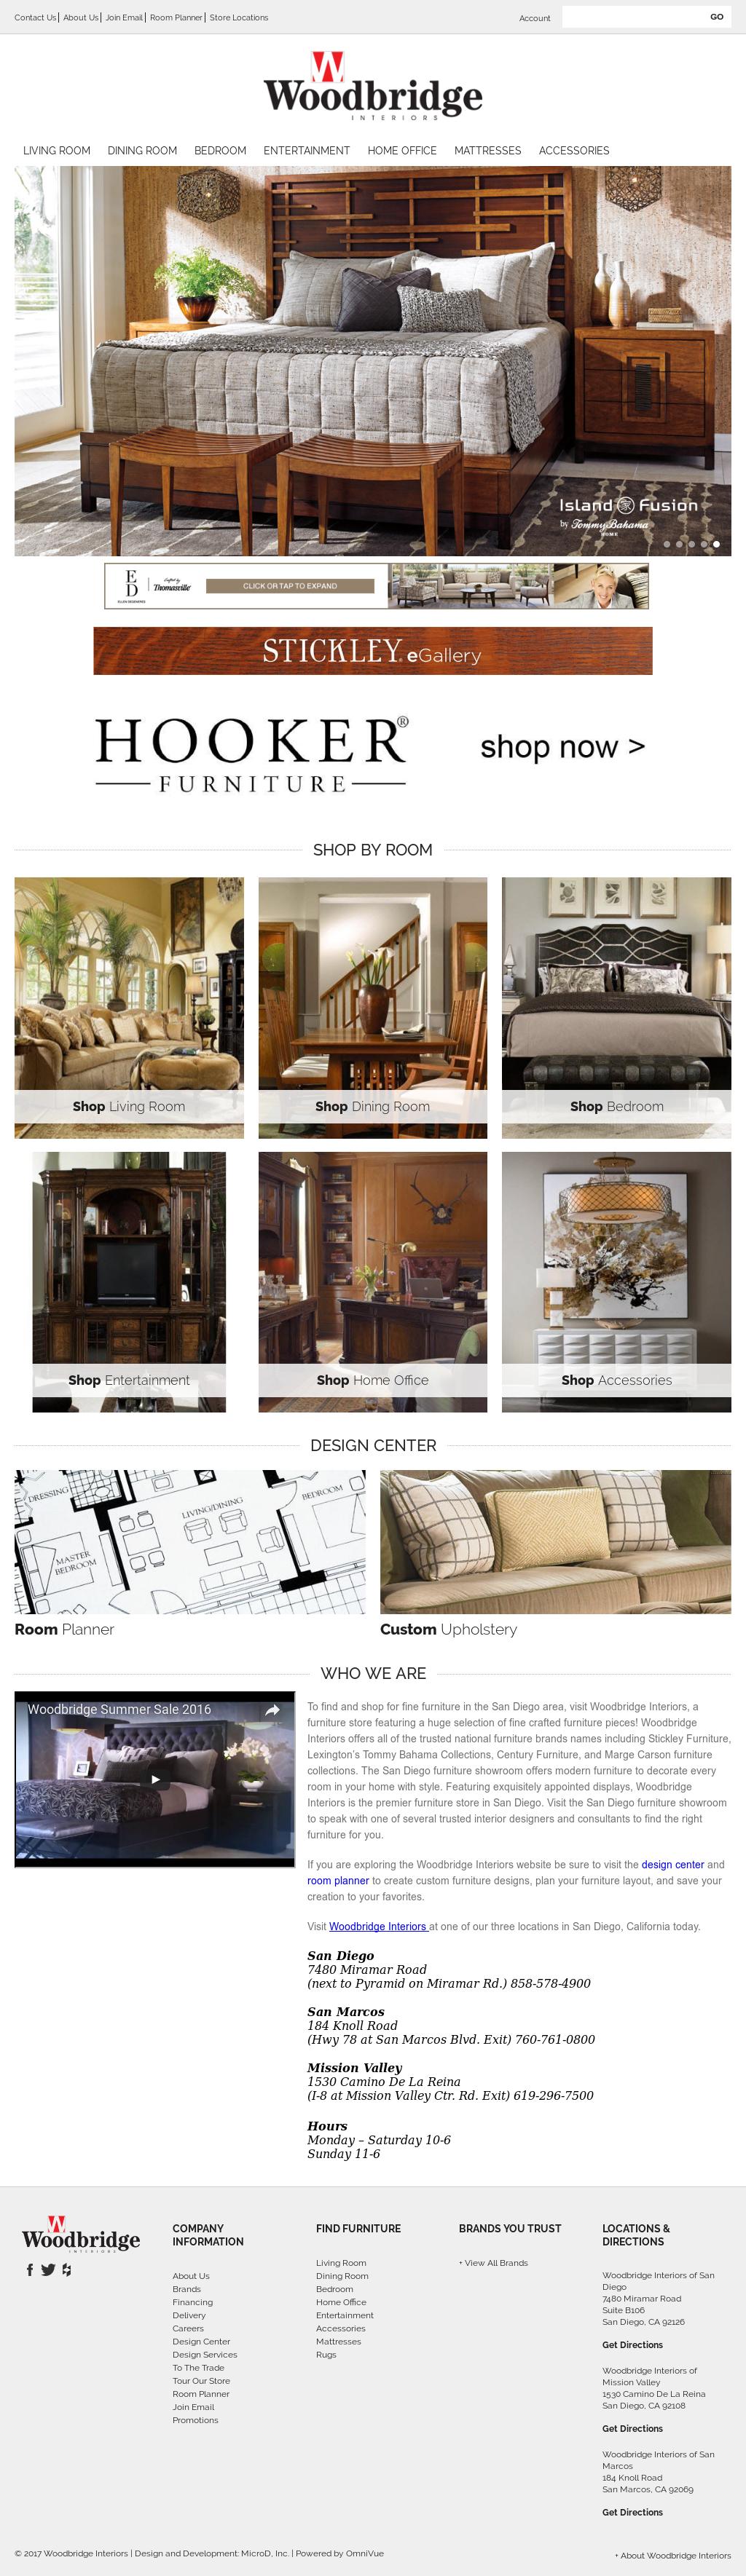 Merveilleux Woodbridge Interiors San Diego Website History